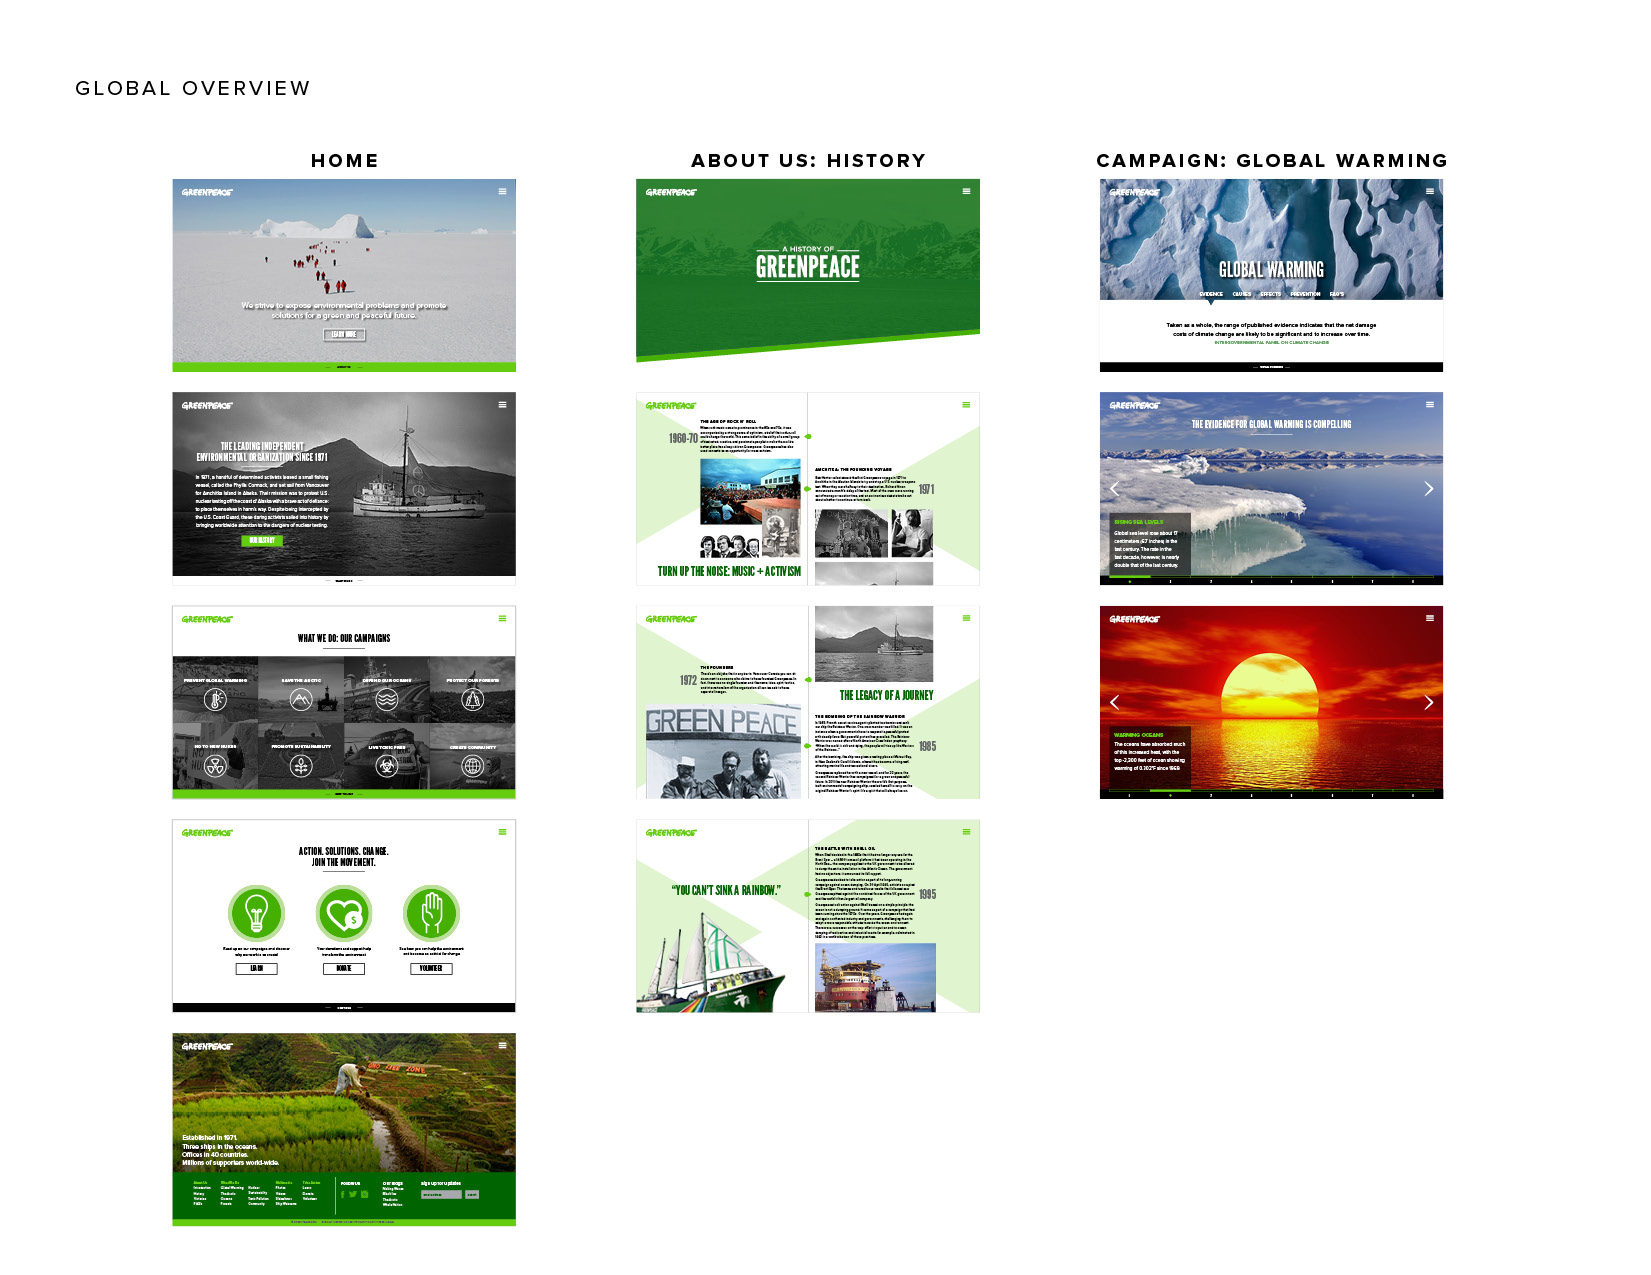 greenpeace22.jpg